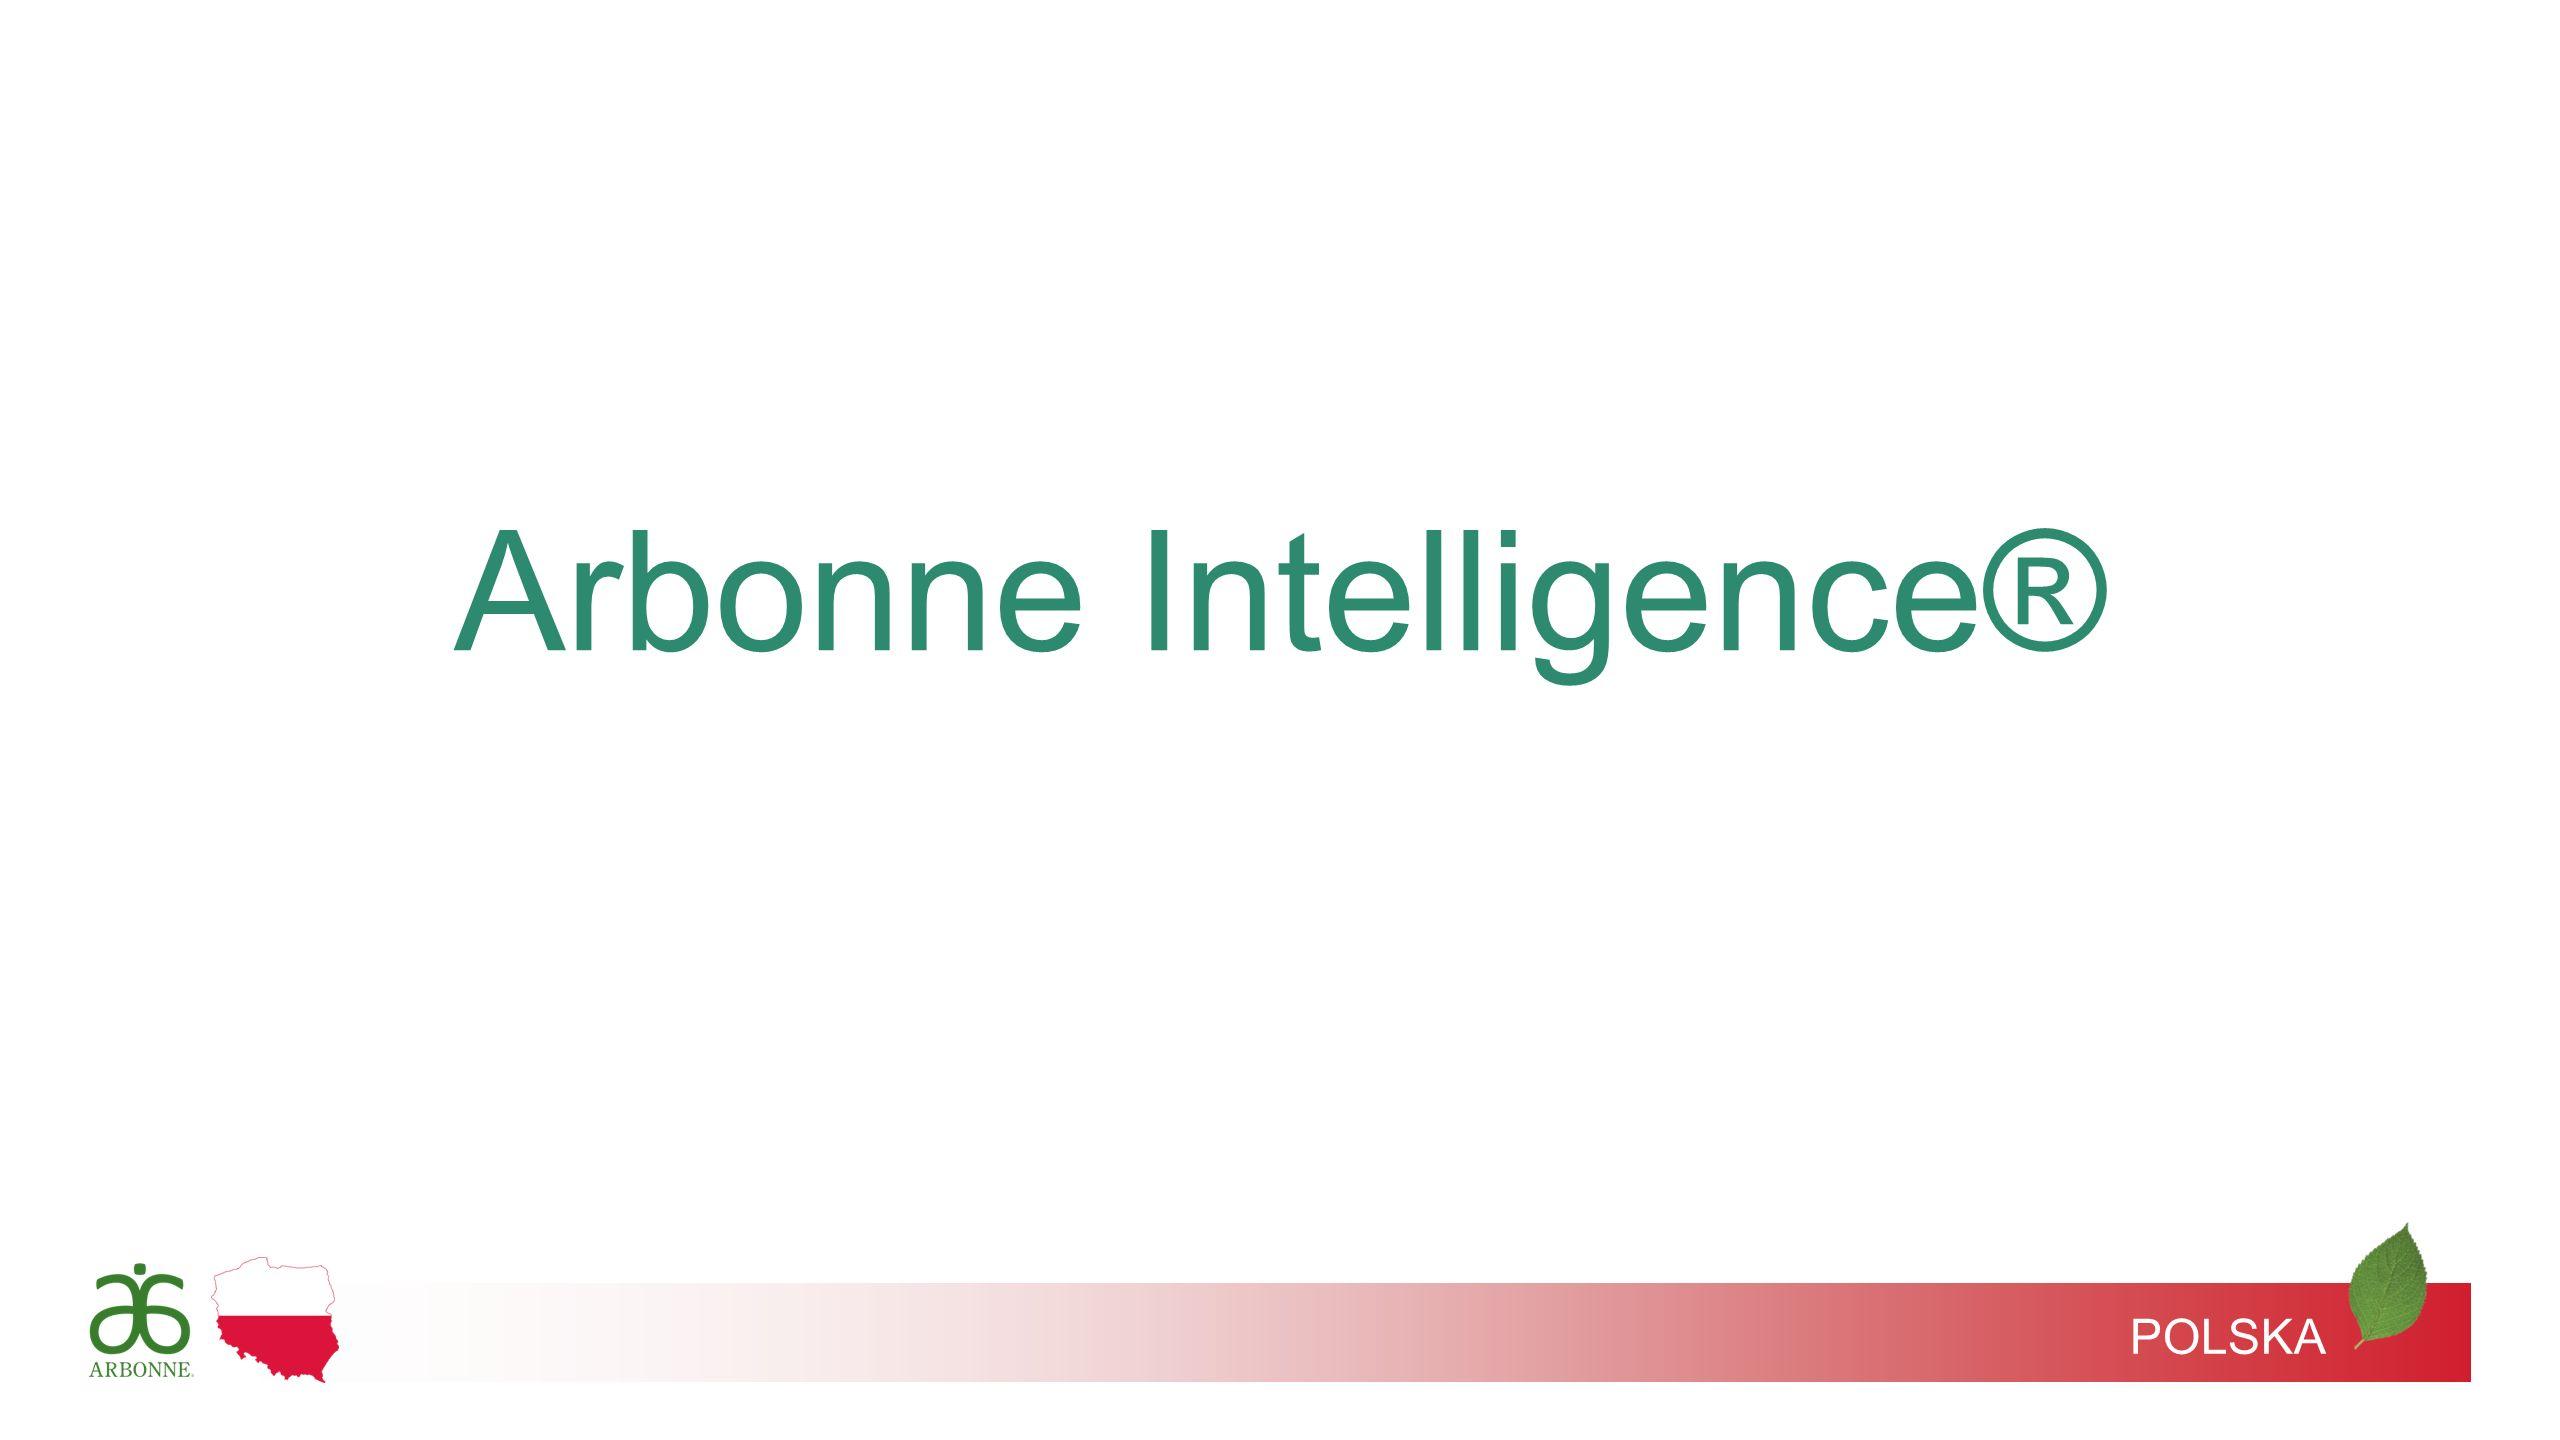 Arbonne Intelligence®